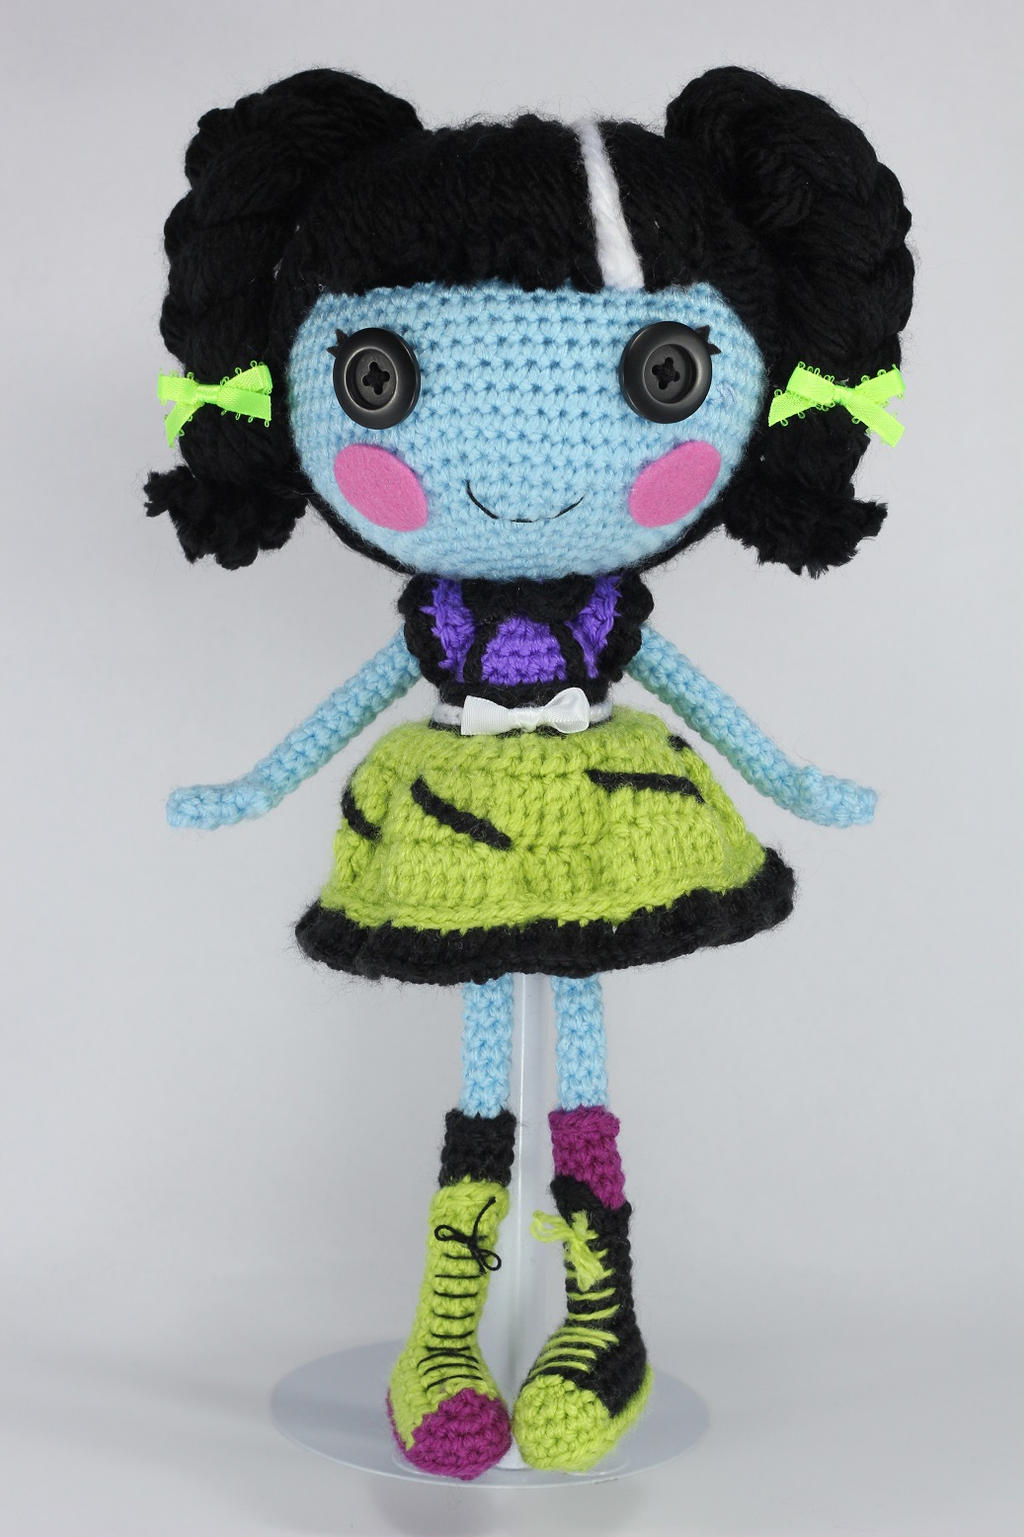 Amigurumi Doll Lalaloopsy : LALALOOPSY Scraps Stitched N Sewn Amigurumi Doll by ...